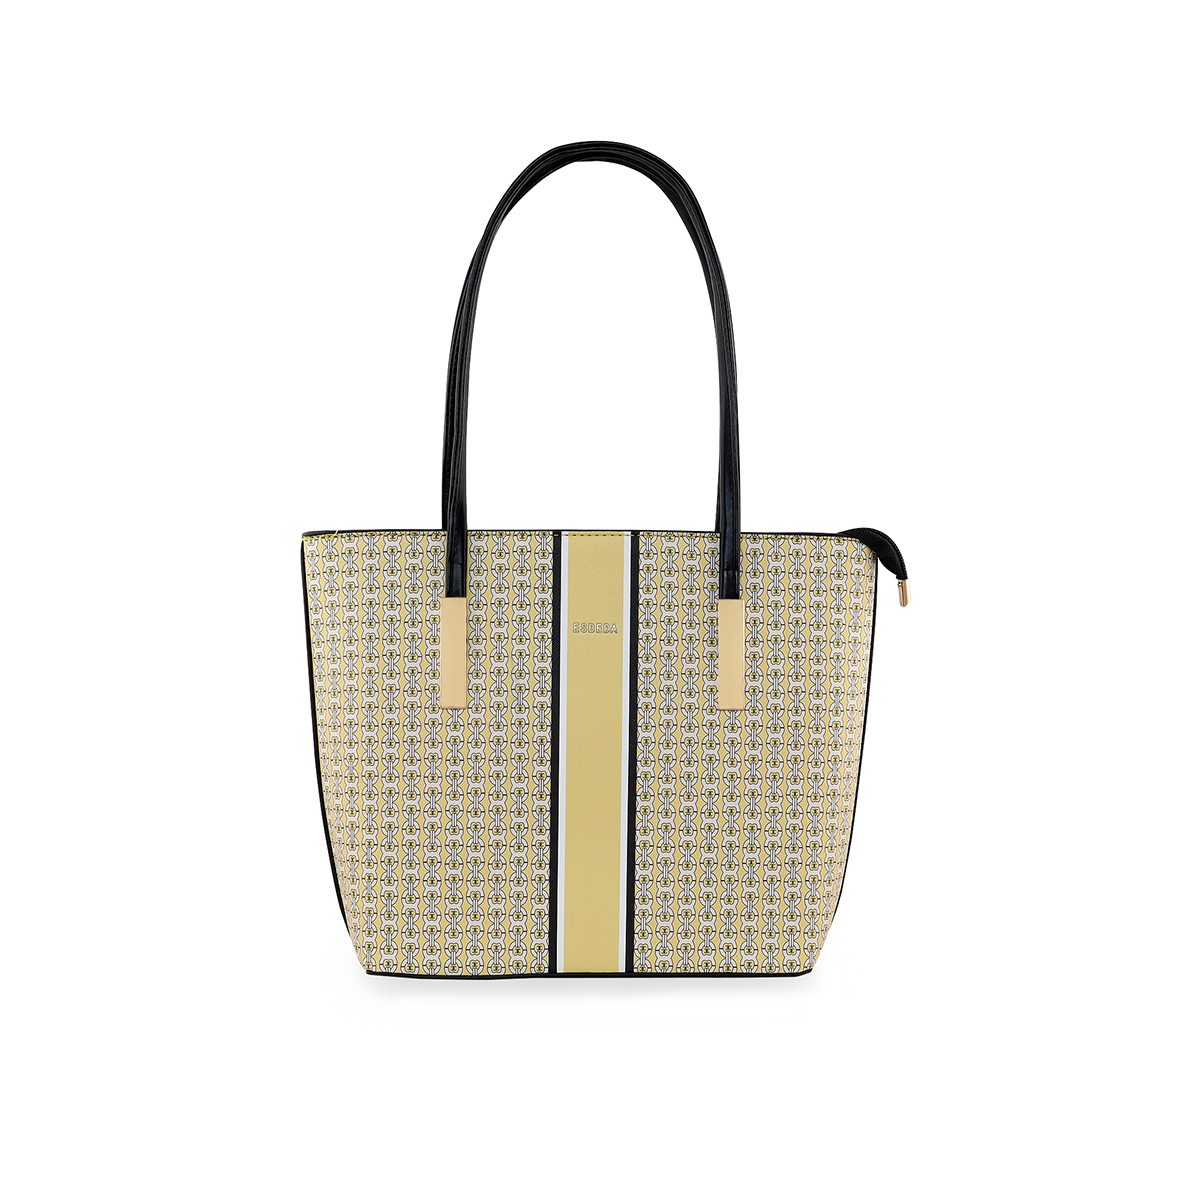 ESBEDA | ESBEDA Yellow Color Logo Printed Basket Handbag For Women